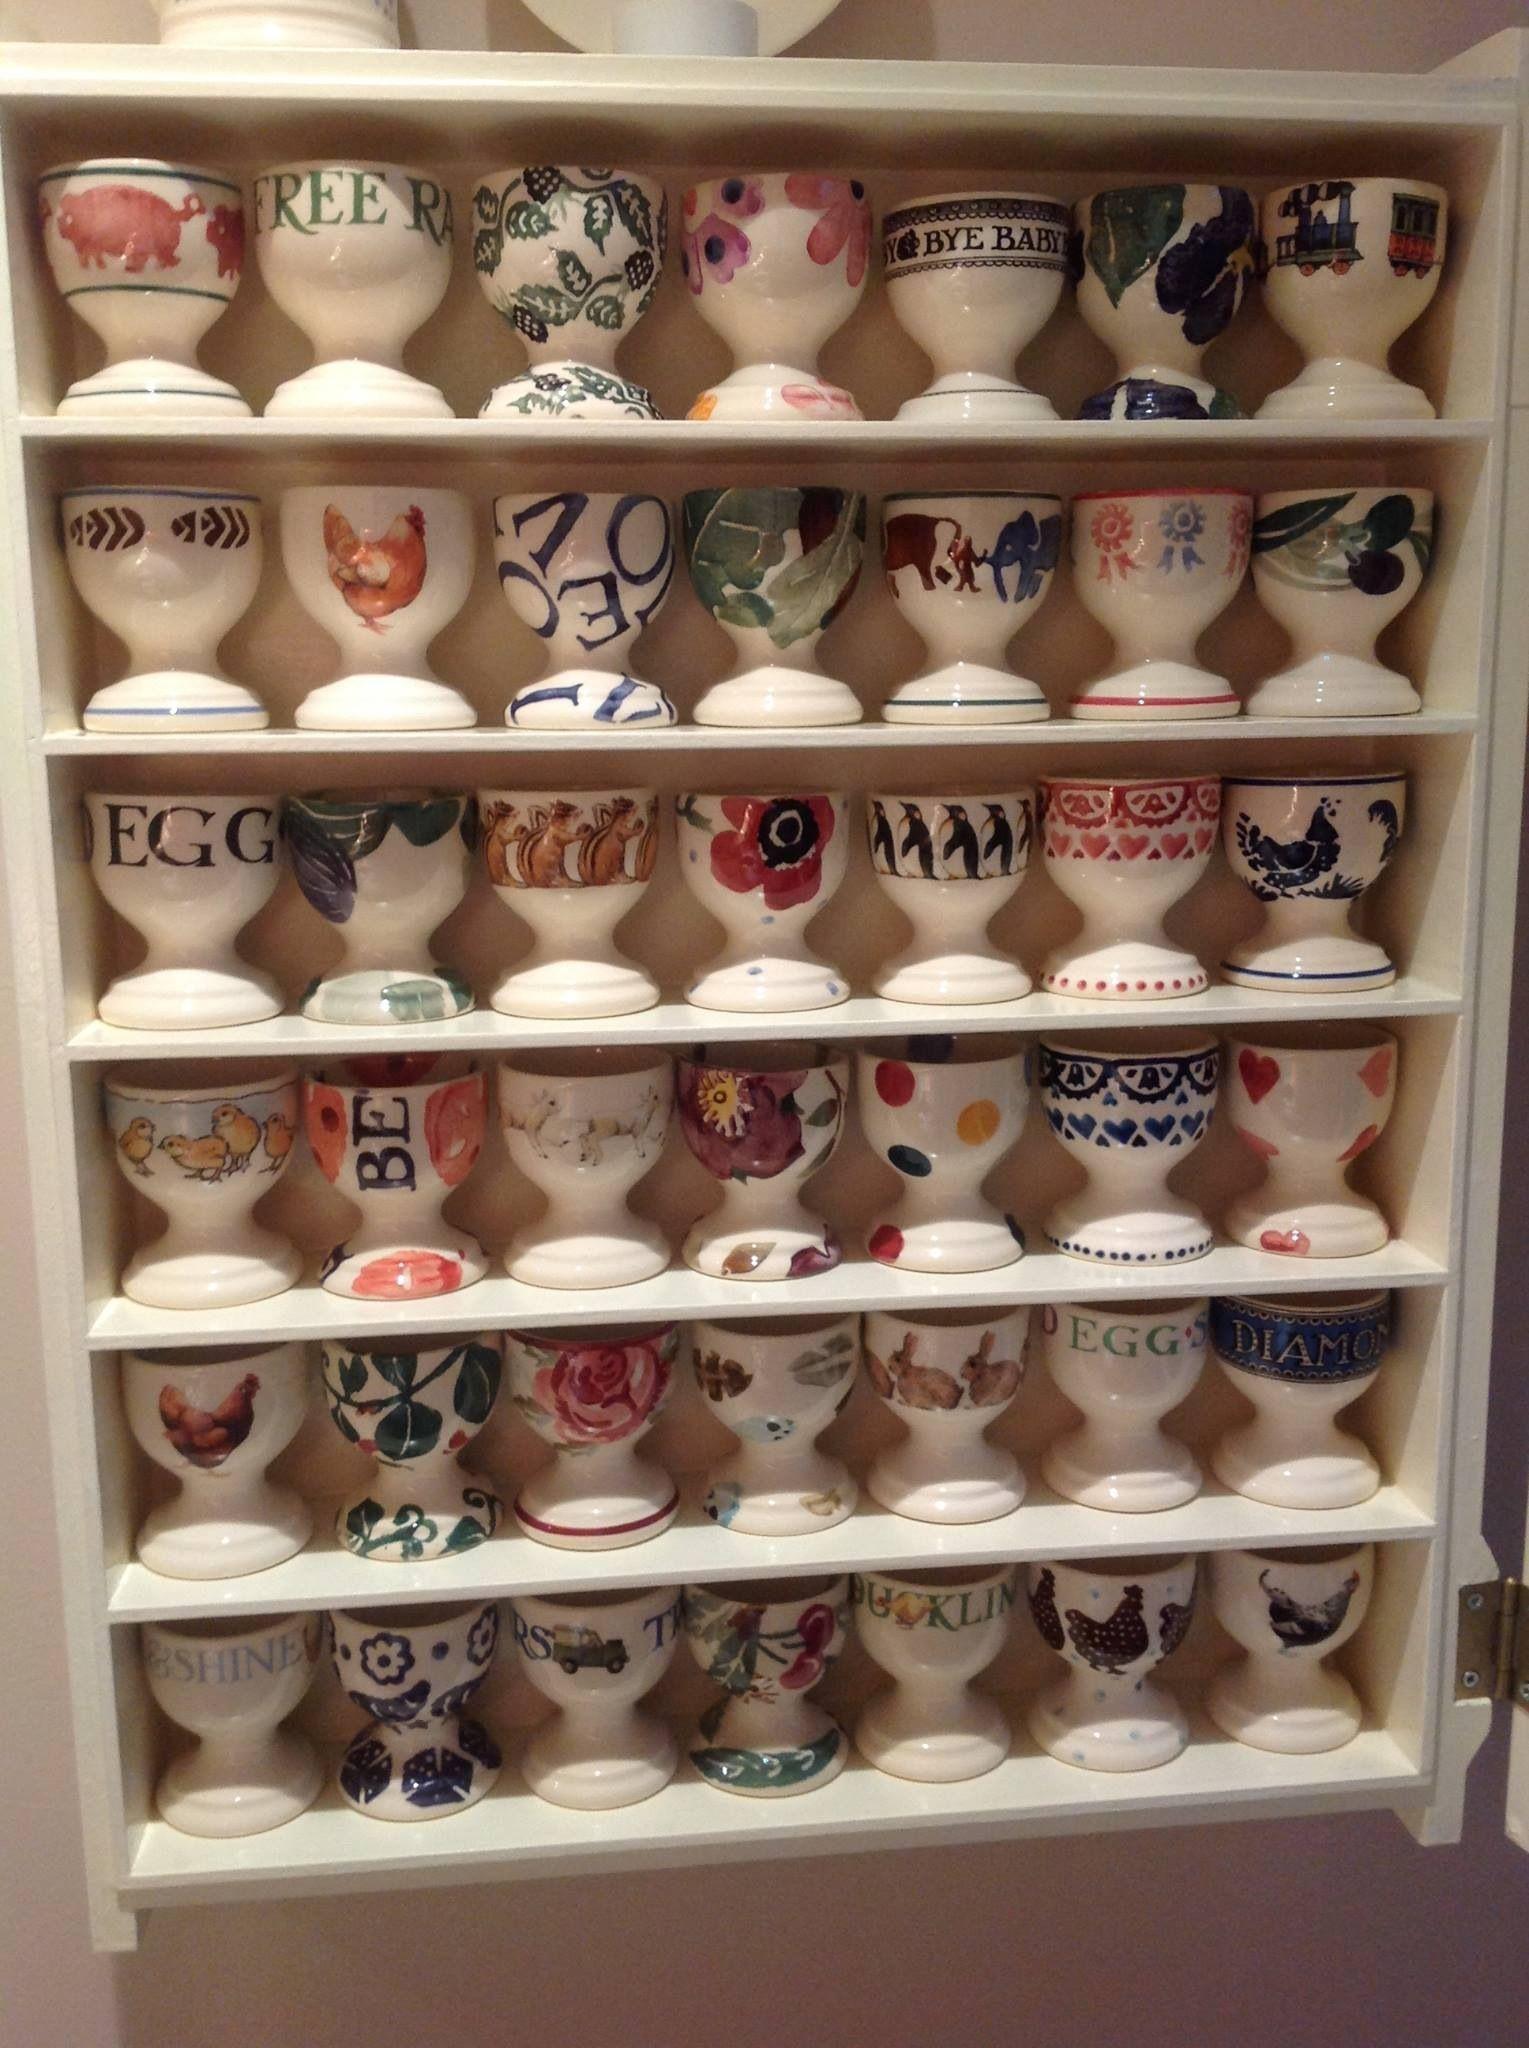 Egg Cup Collection Emma Bridgewater Emma Bridgewater Emma Bridgewater Pottery Vintage Egg Cups